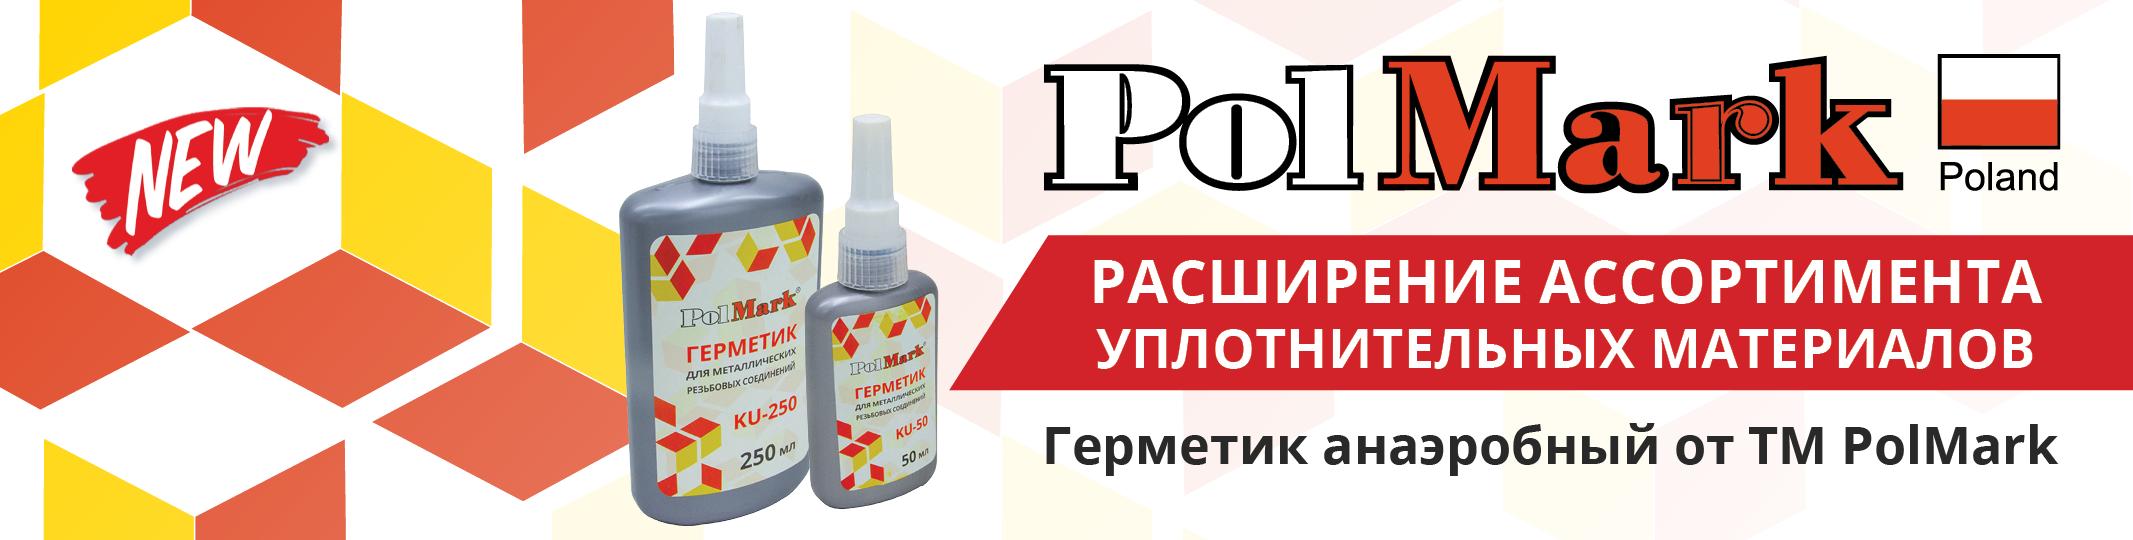 Banner_News_Polmark_germetik_site_1024x259px_150